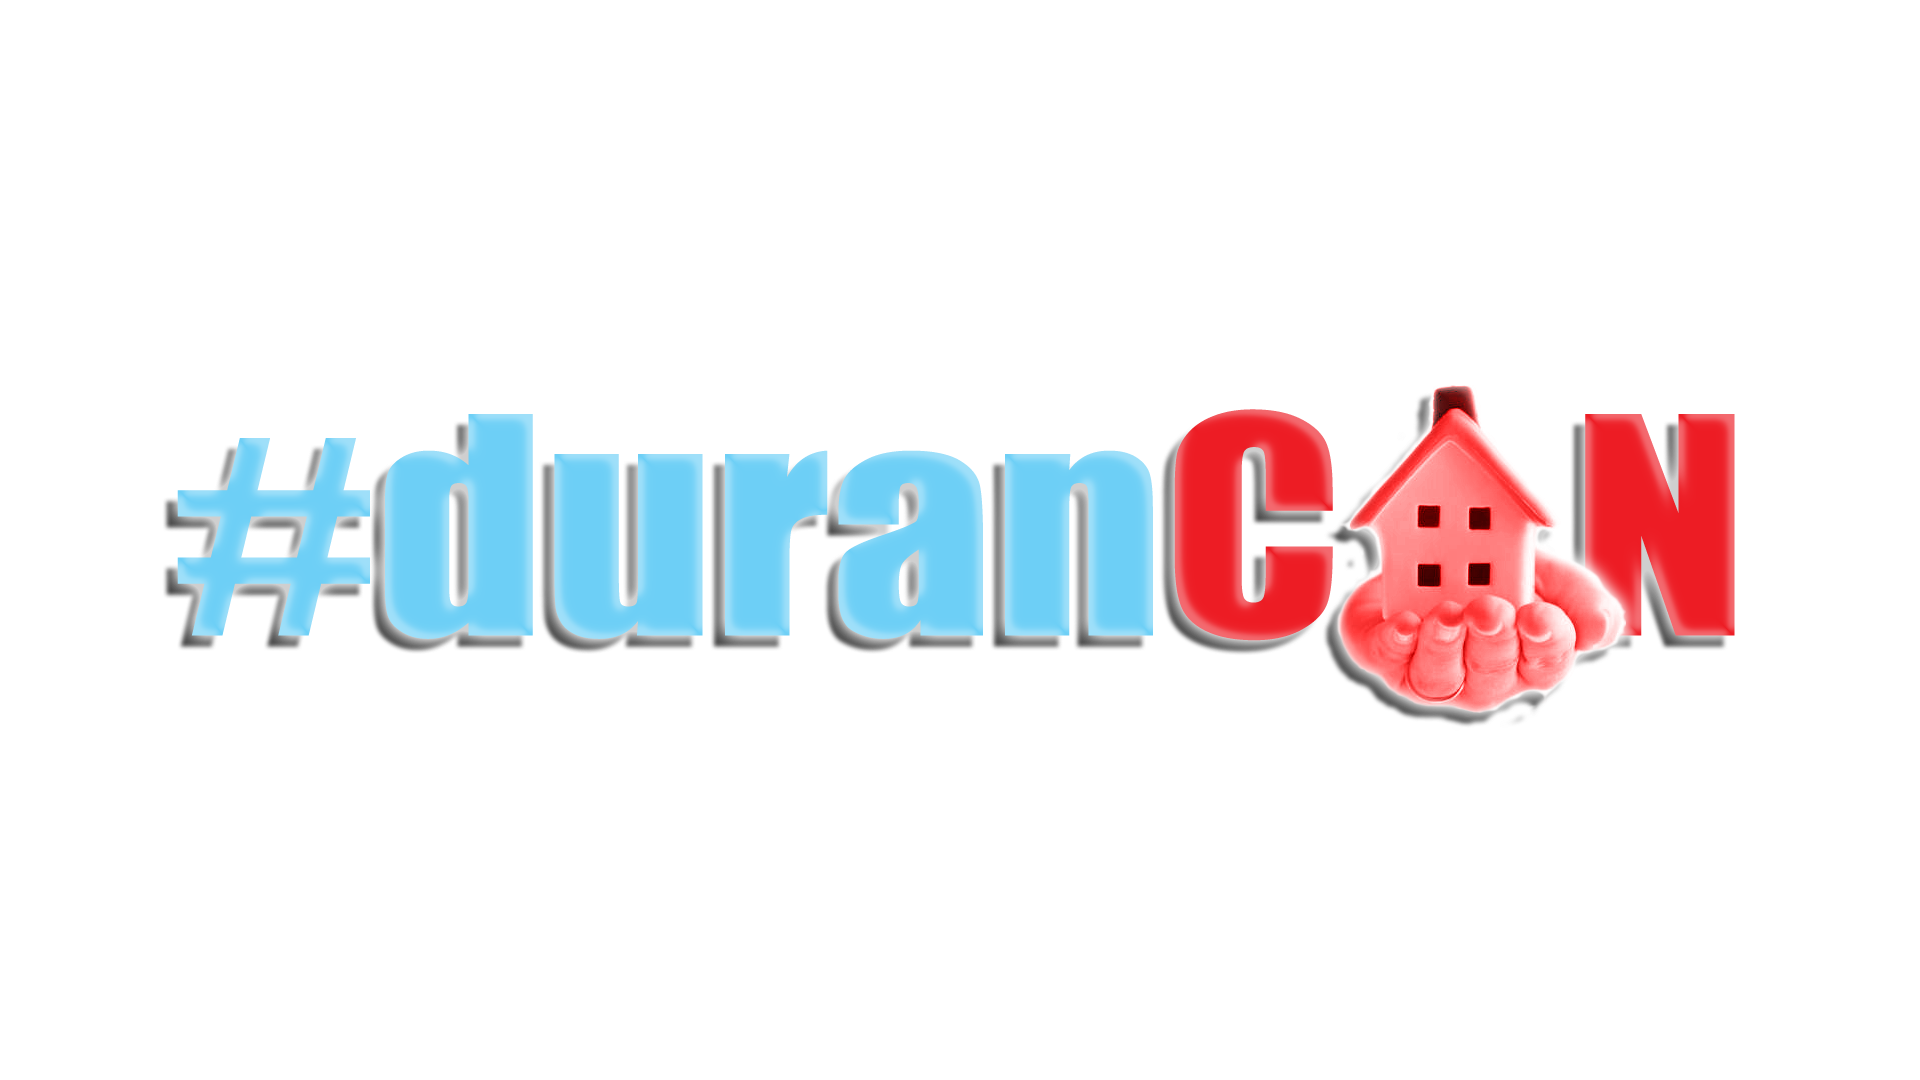 #DuranCAN